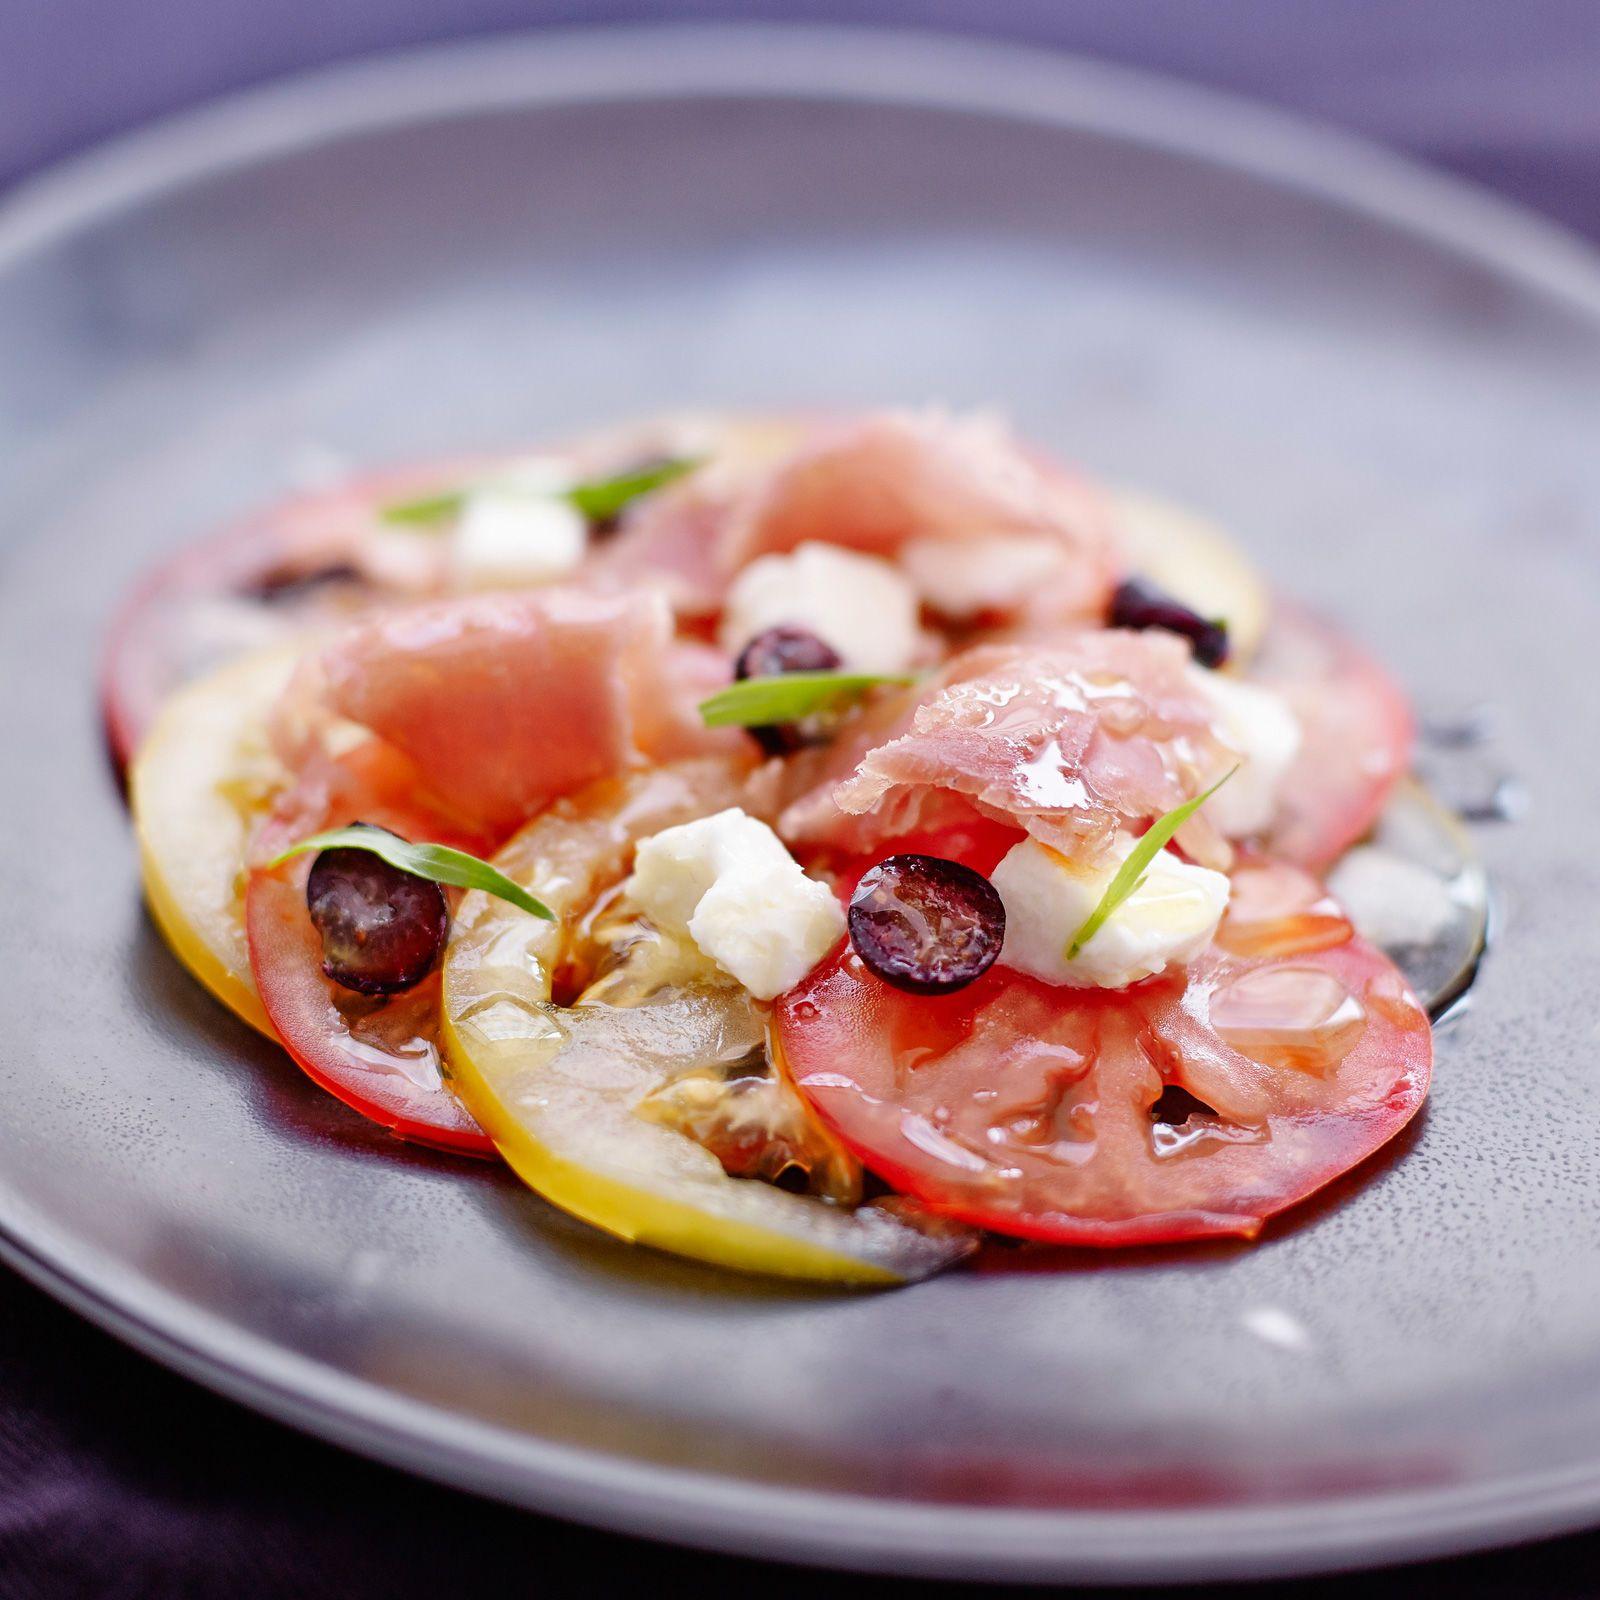 Carpaccio de tomates, facile et pas cher